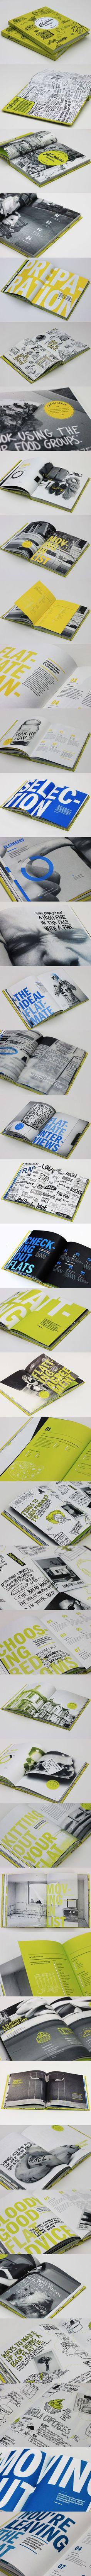 editorial layout, graphic design, layout design, booklet design, editori design, brochur, book layouts, book design, print